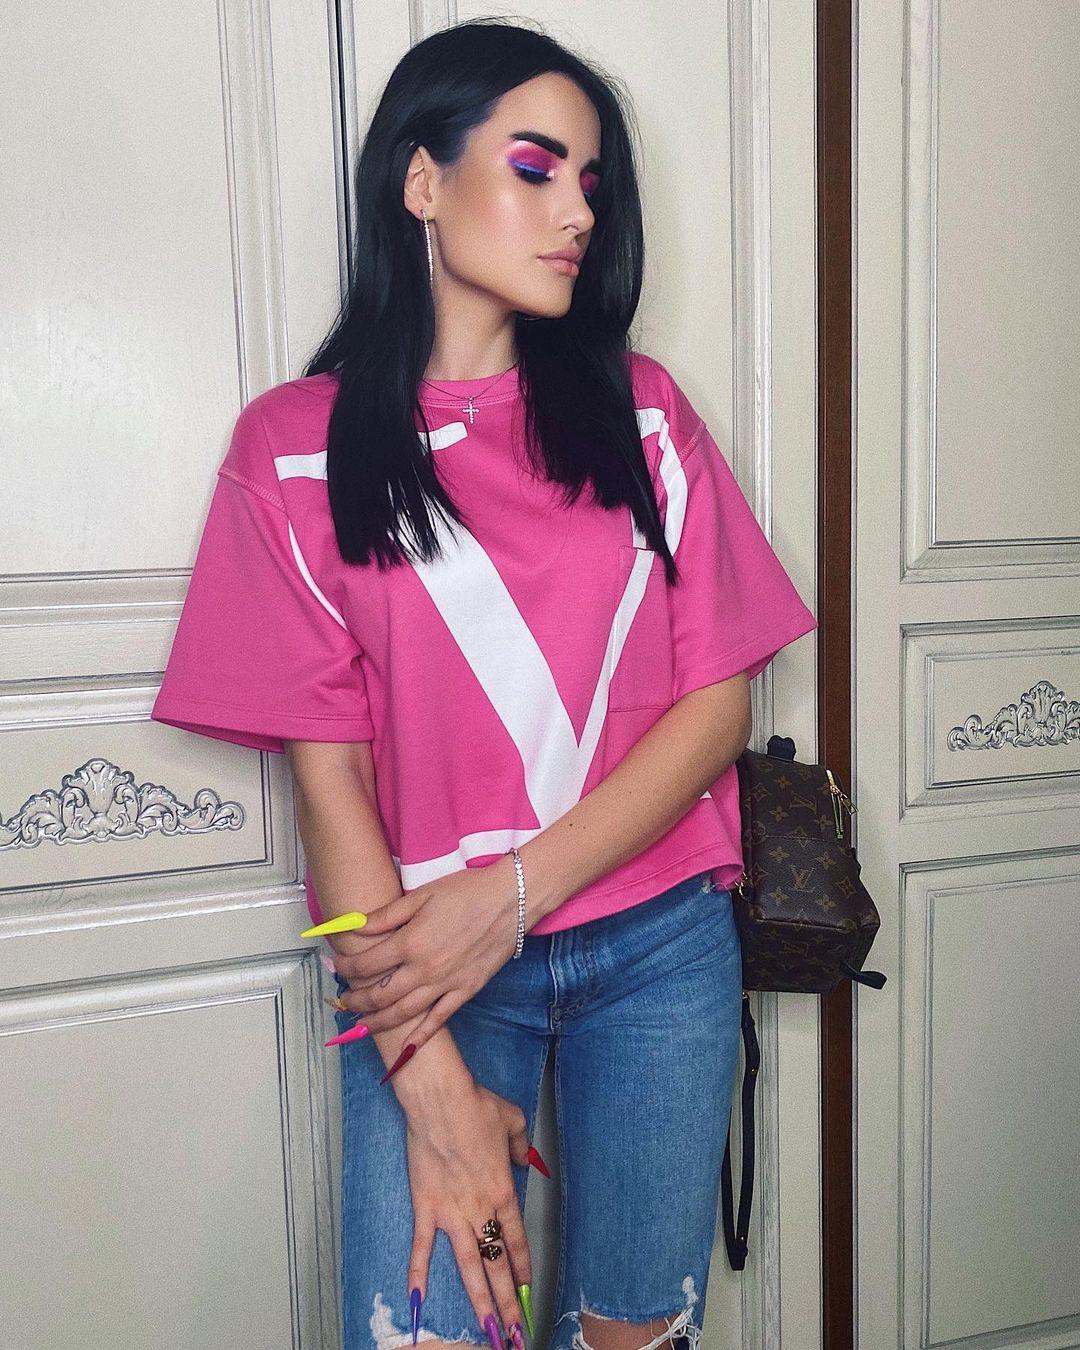 Karina-Arakelyan-Wallpapers-Insta-Fit-Bio-19